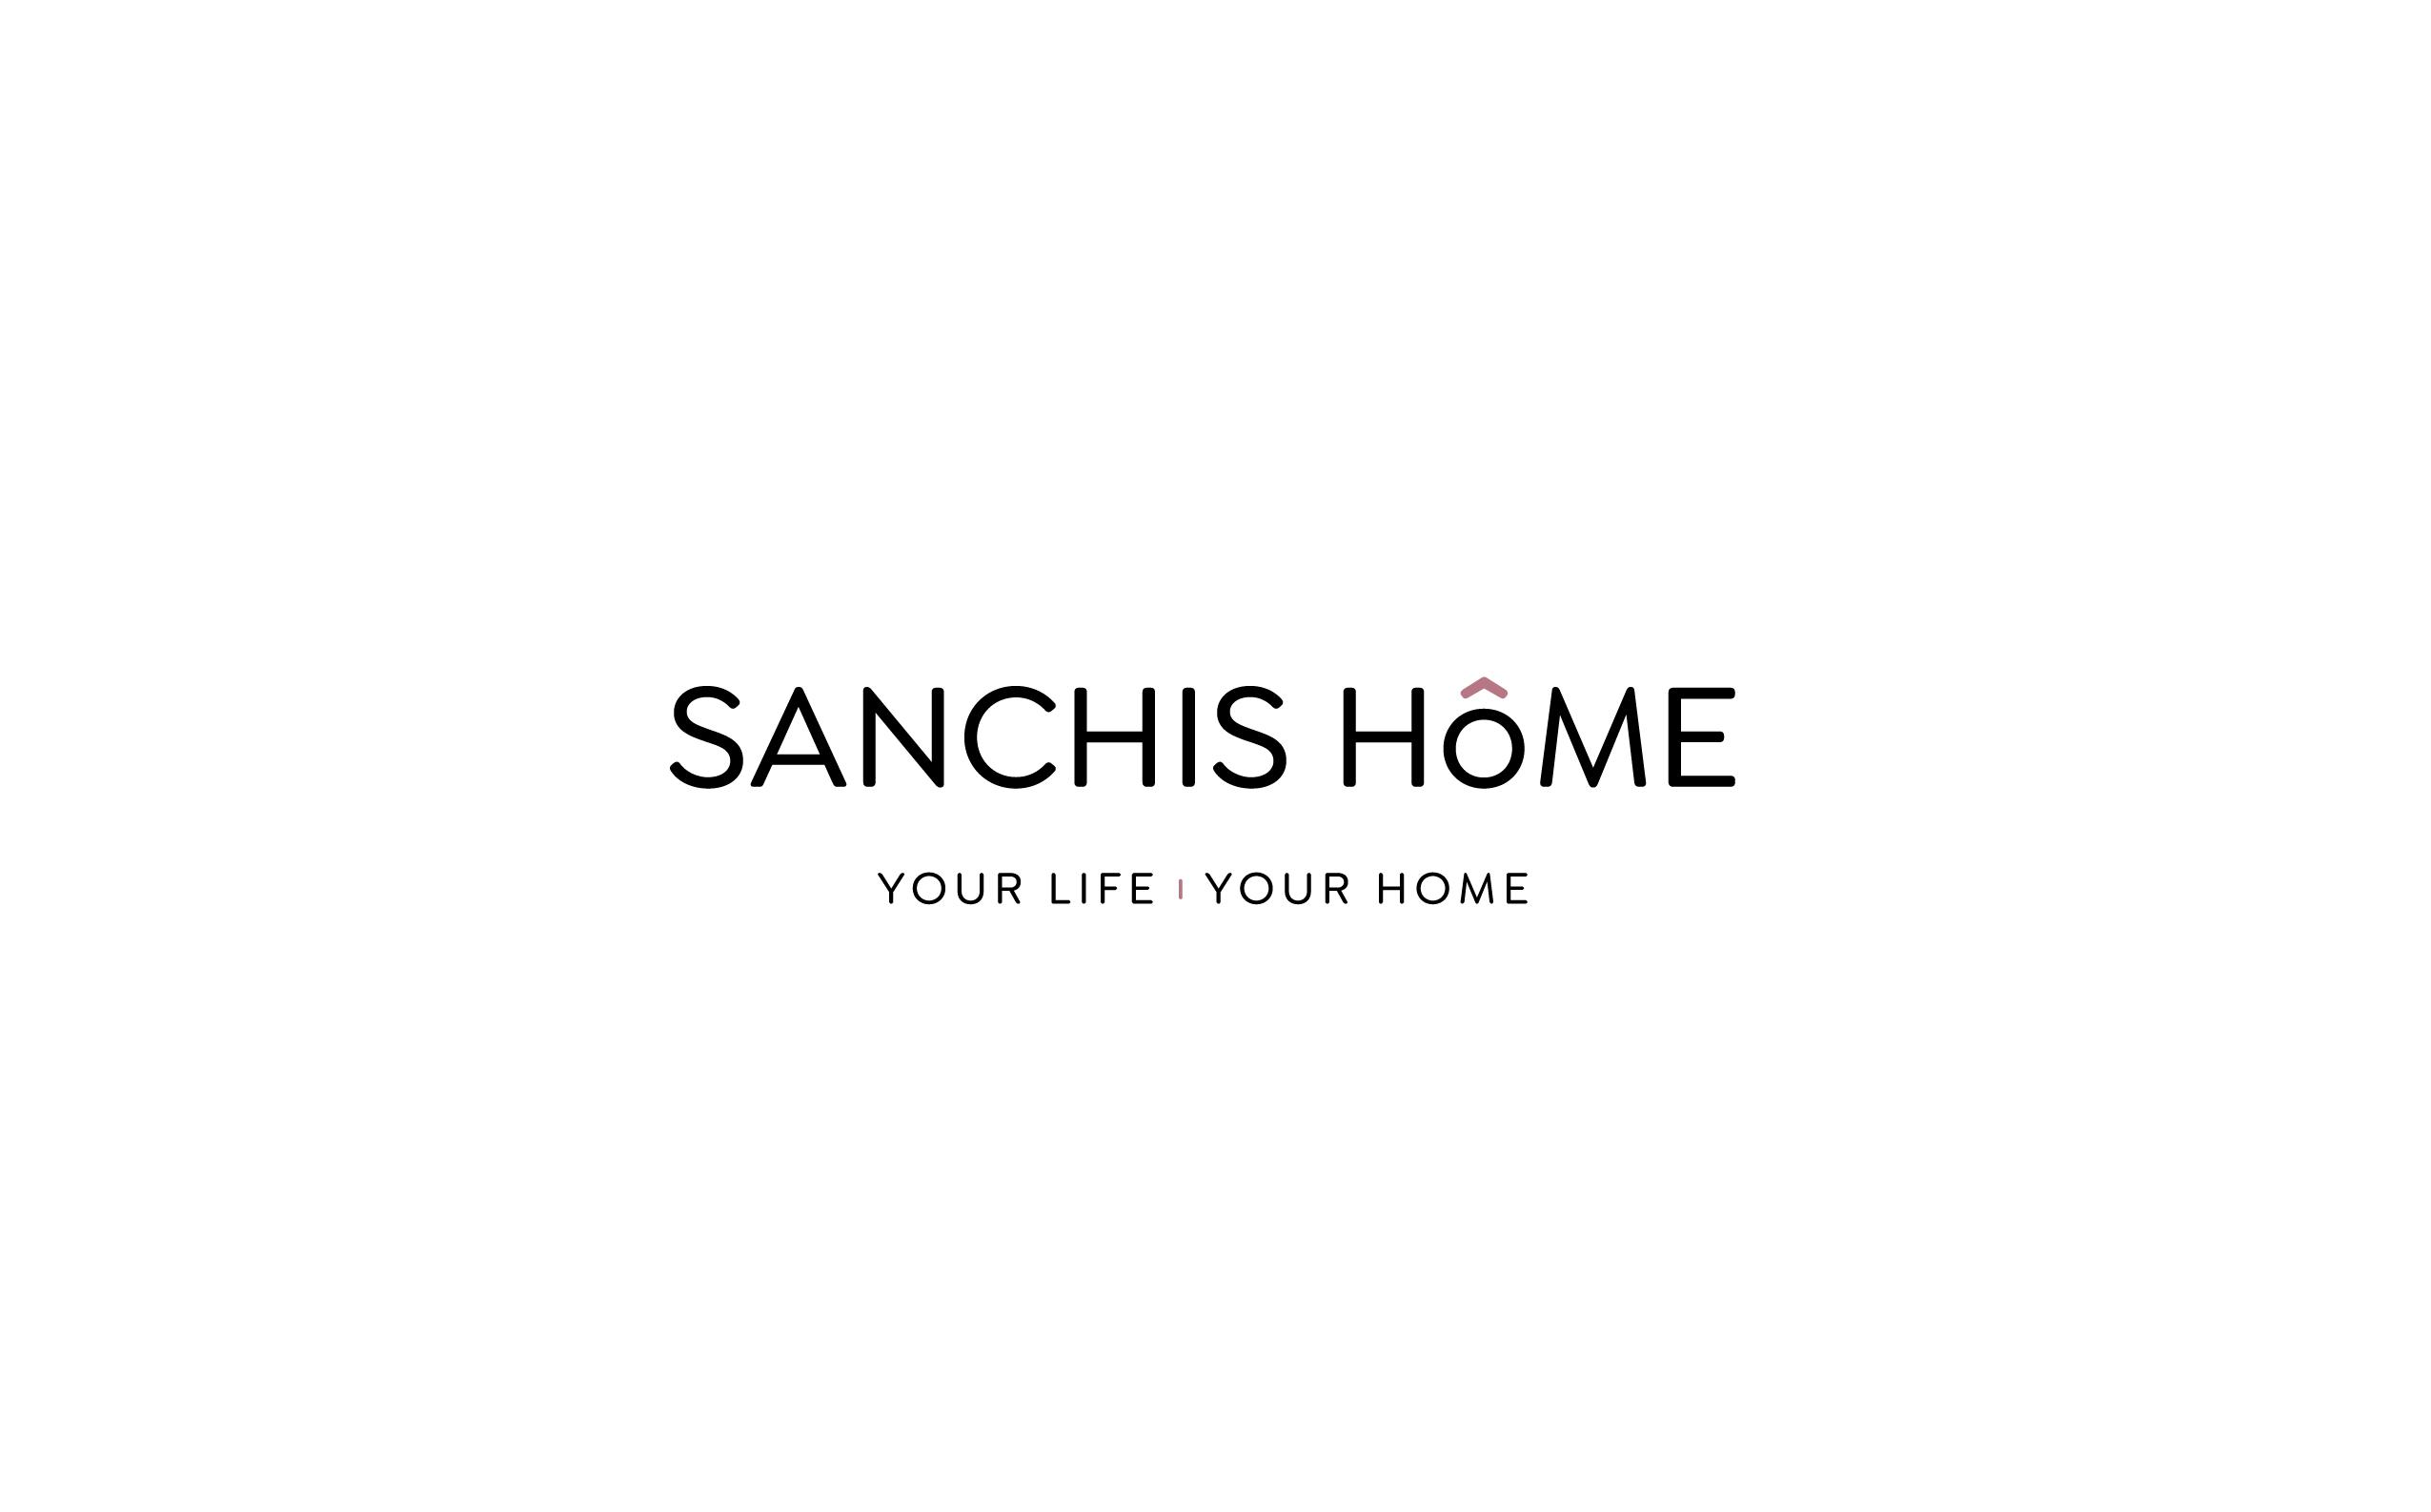 SANCHIS HOME CERAMICA SLU